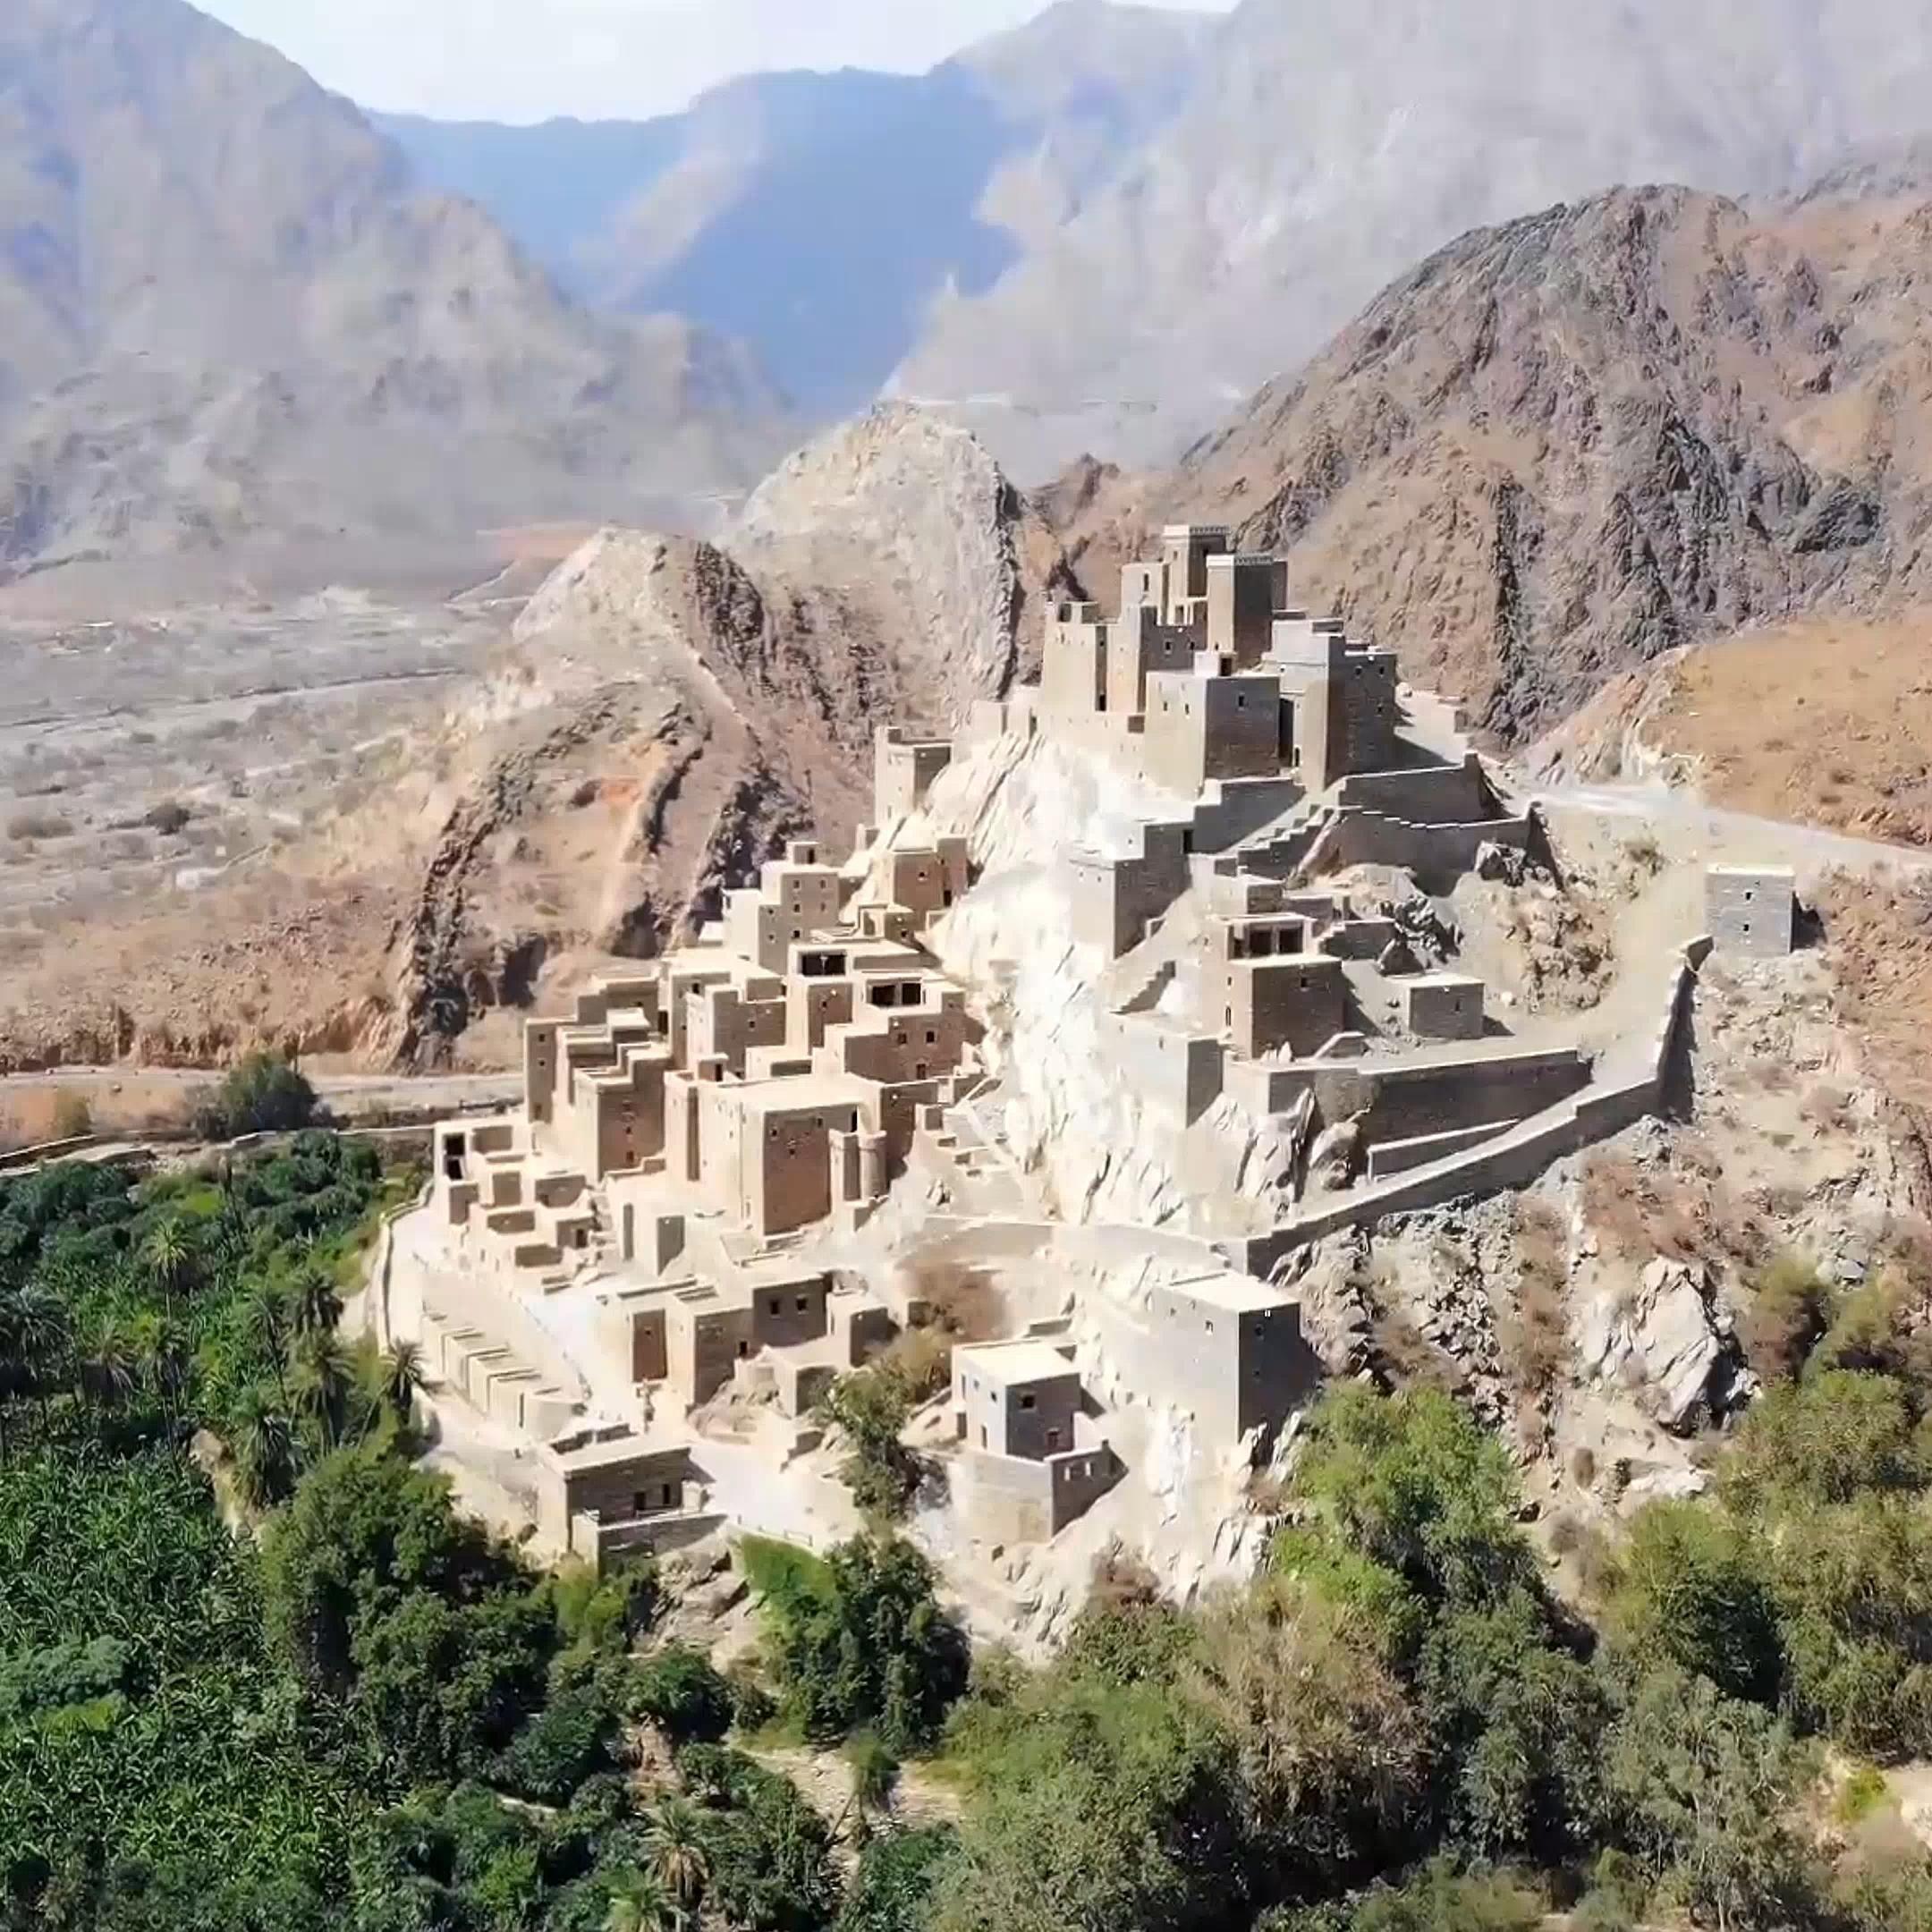 Dhy Ain Village Al Baha Saudi Arabia Video In 2021 Saudi Arabia Culture Baha Saudi Arabia